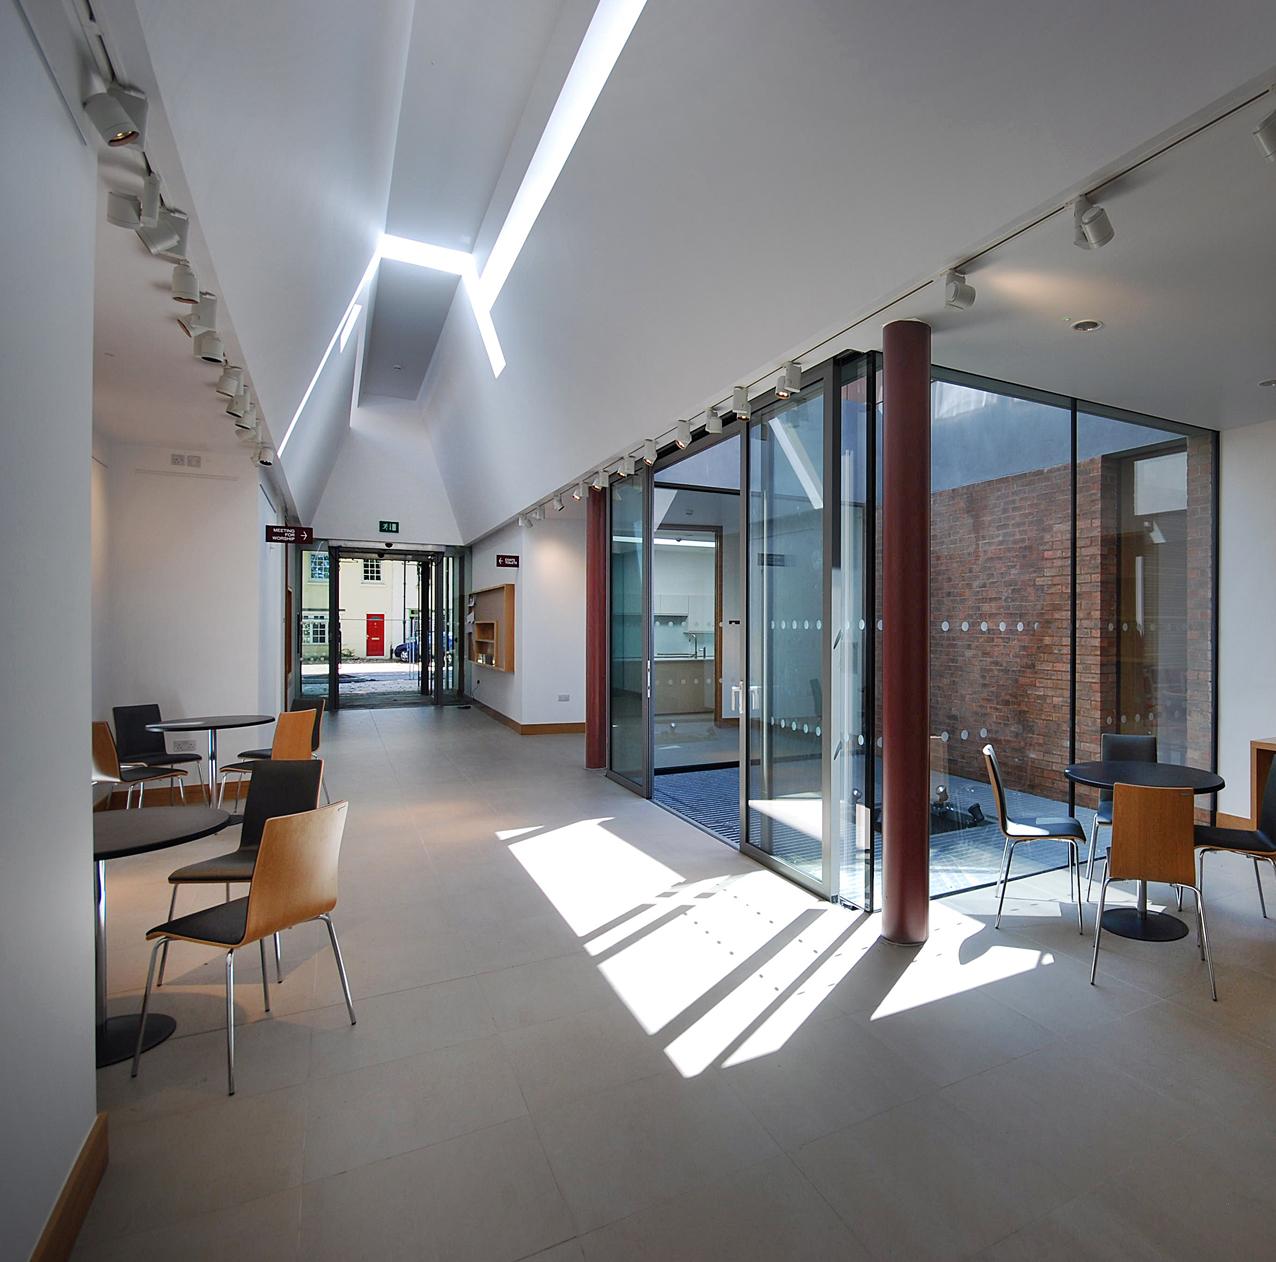 New build Quaker Meeting House, Kingston KT1